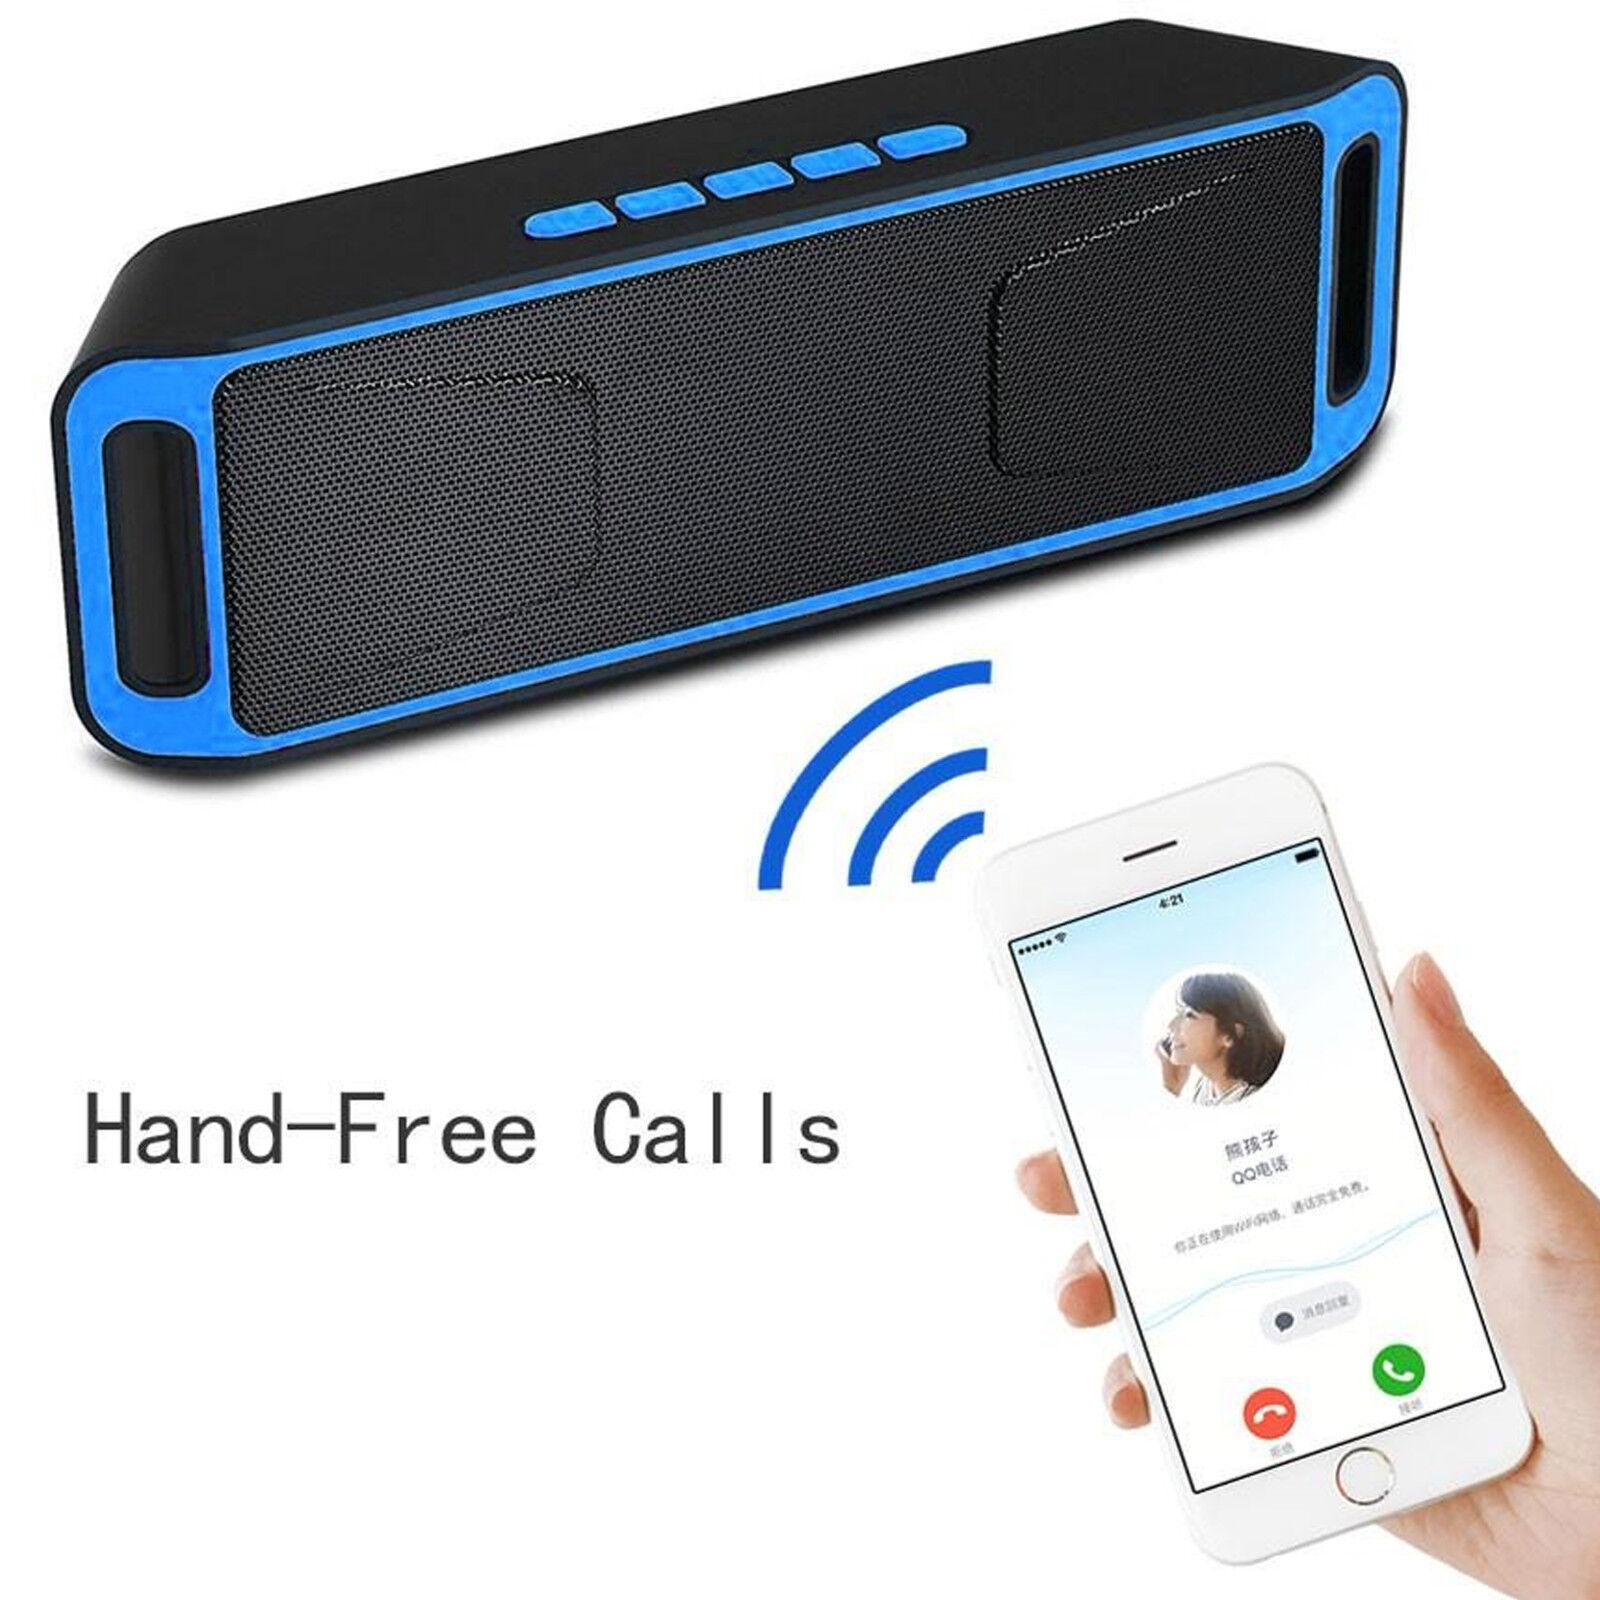 Portable Wireless Bluetooth Speaker Waterproof Bass USB/TF/AUX MP3 Radio Playe R 4